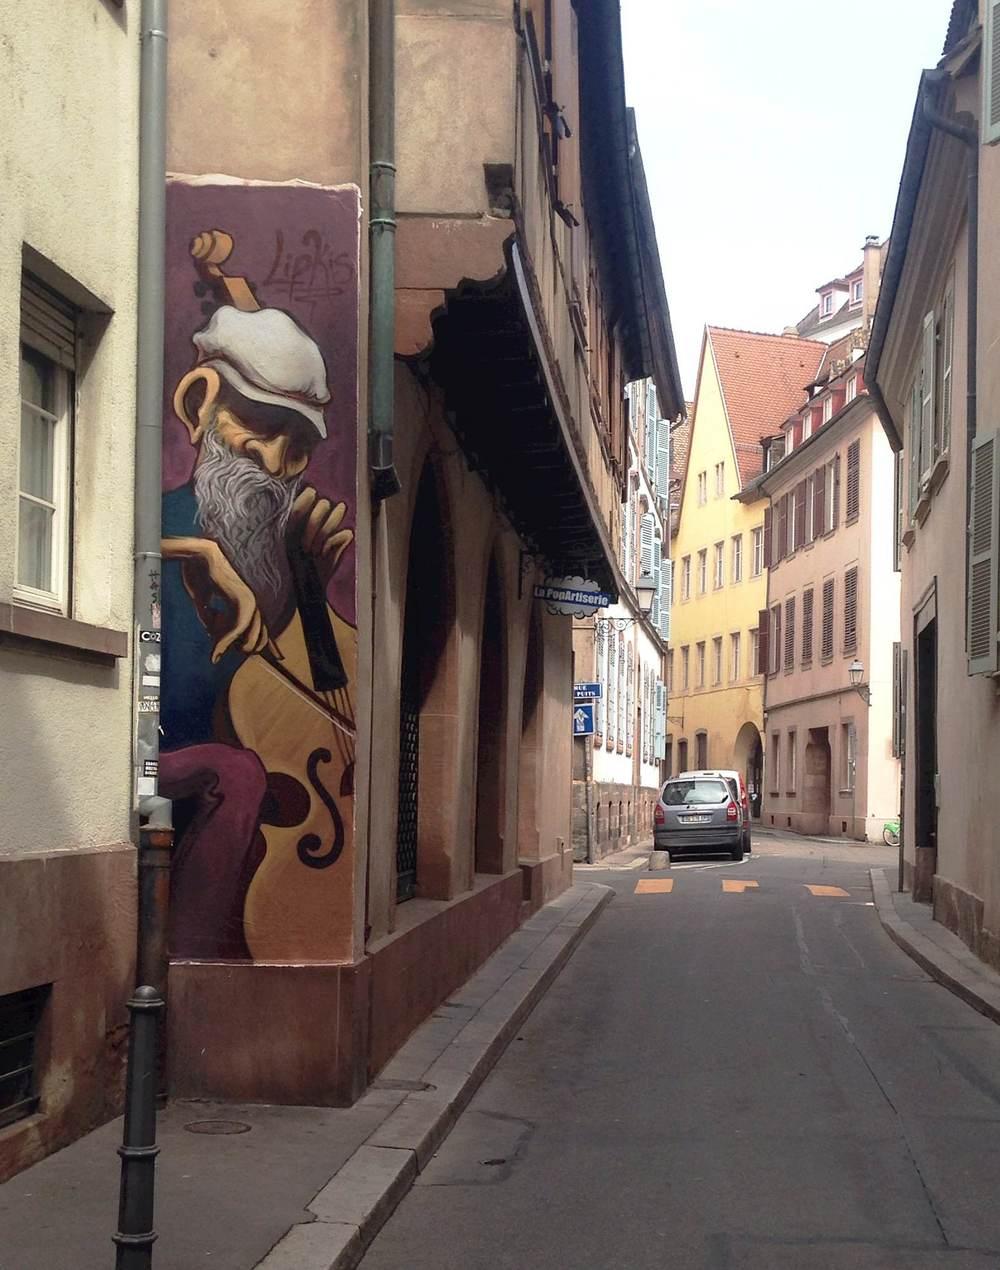 Alleyway Busker